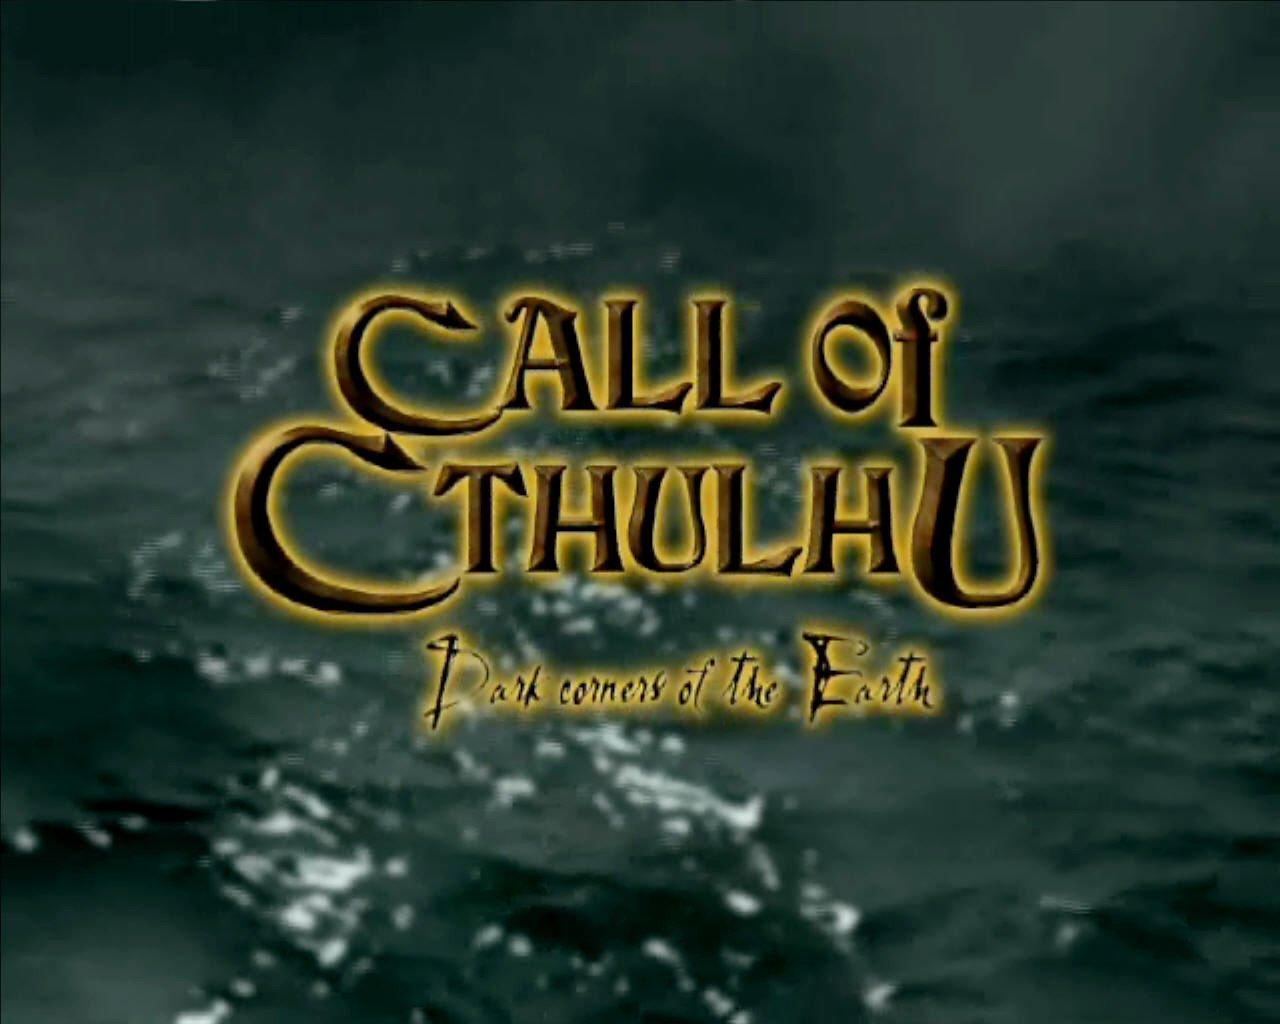 I voted for Cthulhu! - Изображение 6